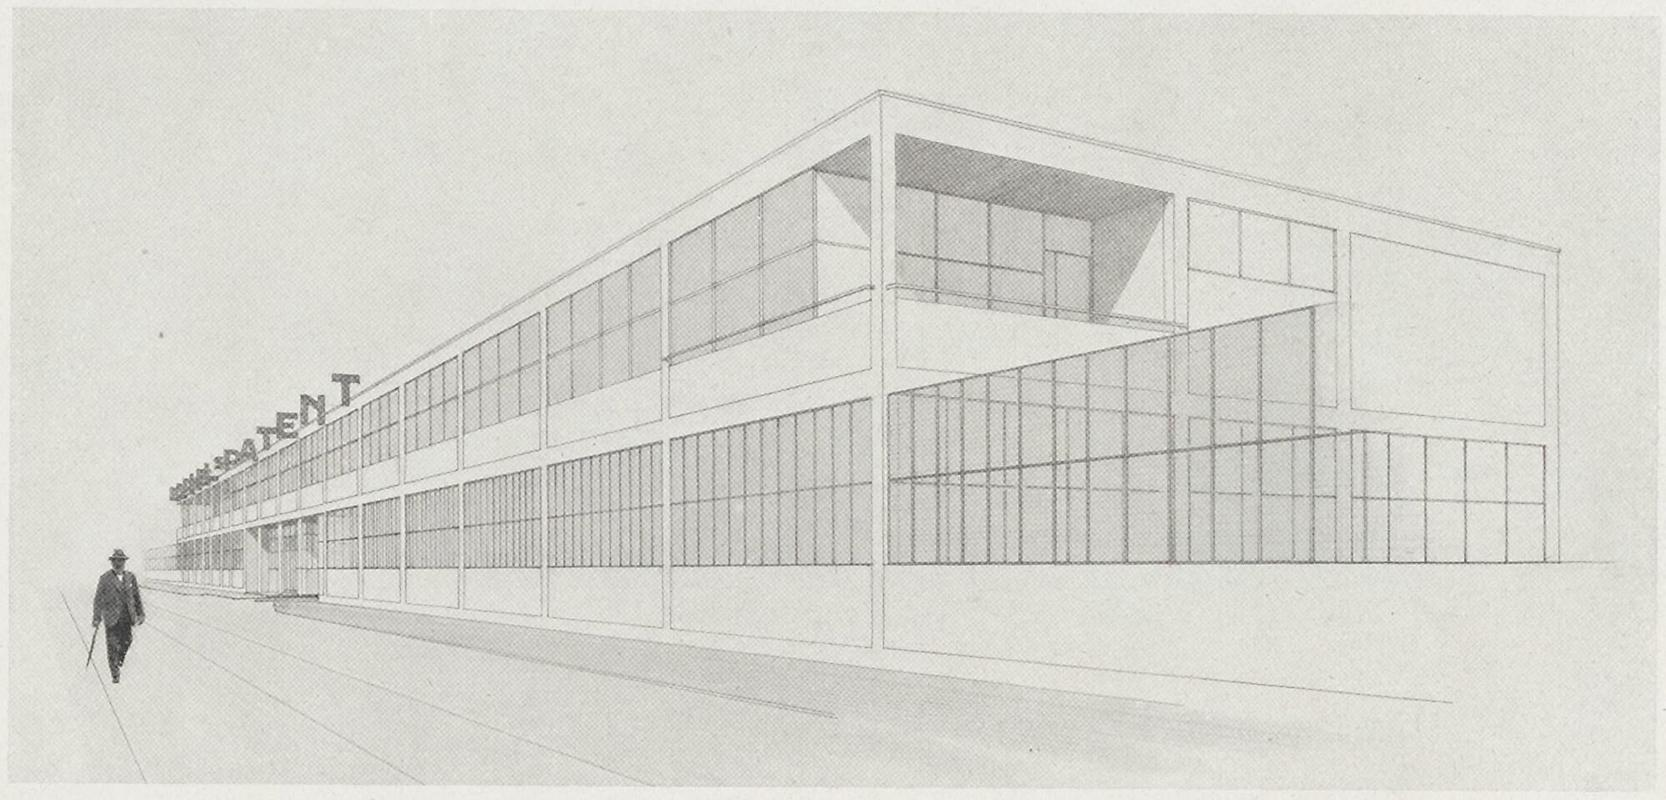 Mart Stam. Bauhaus 3-1 1929, 20